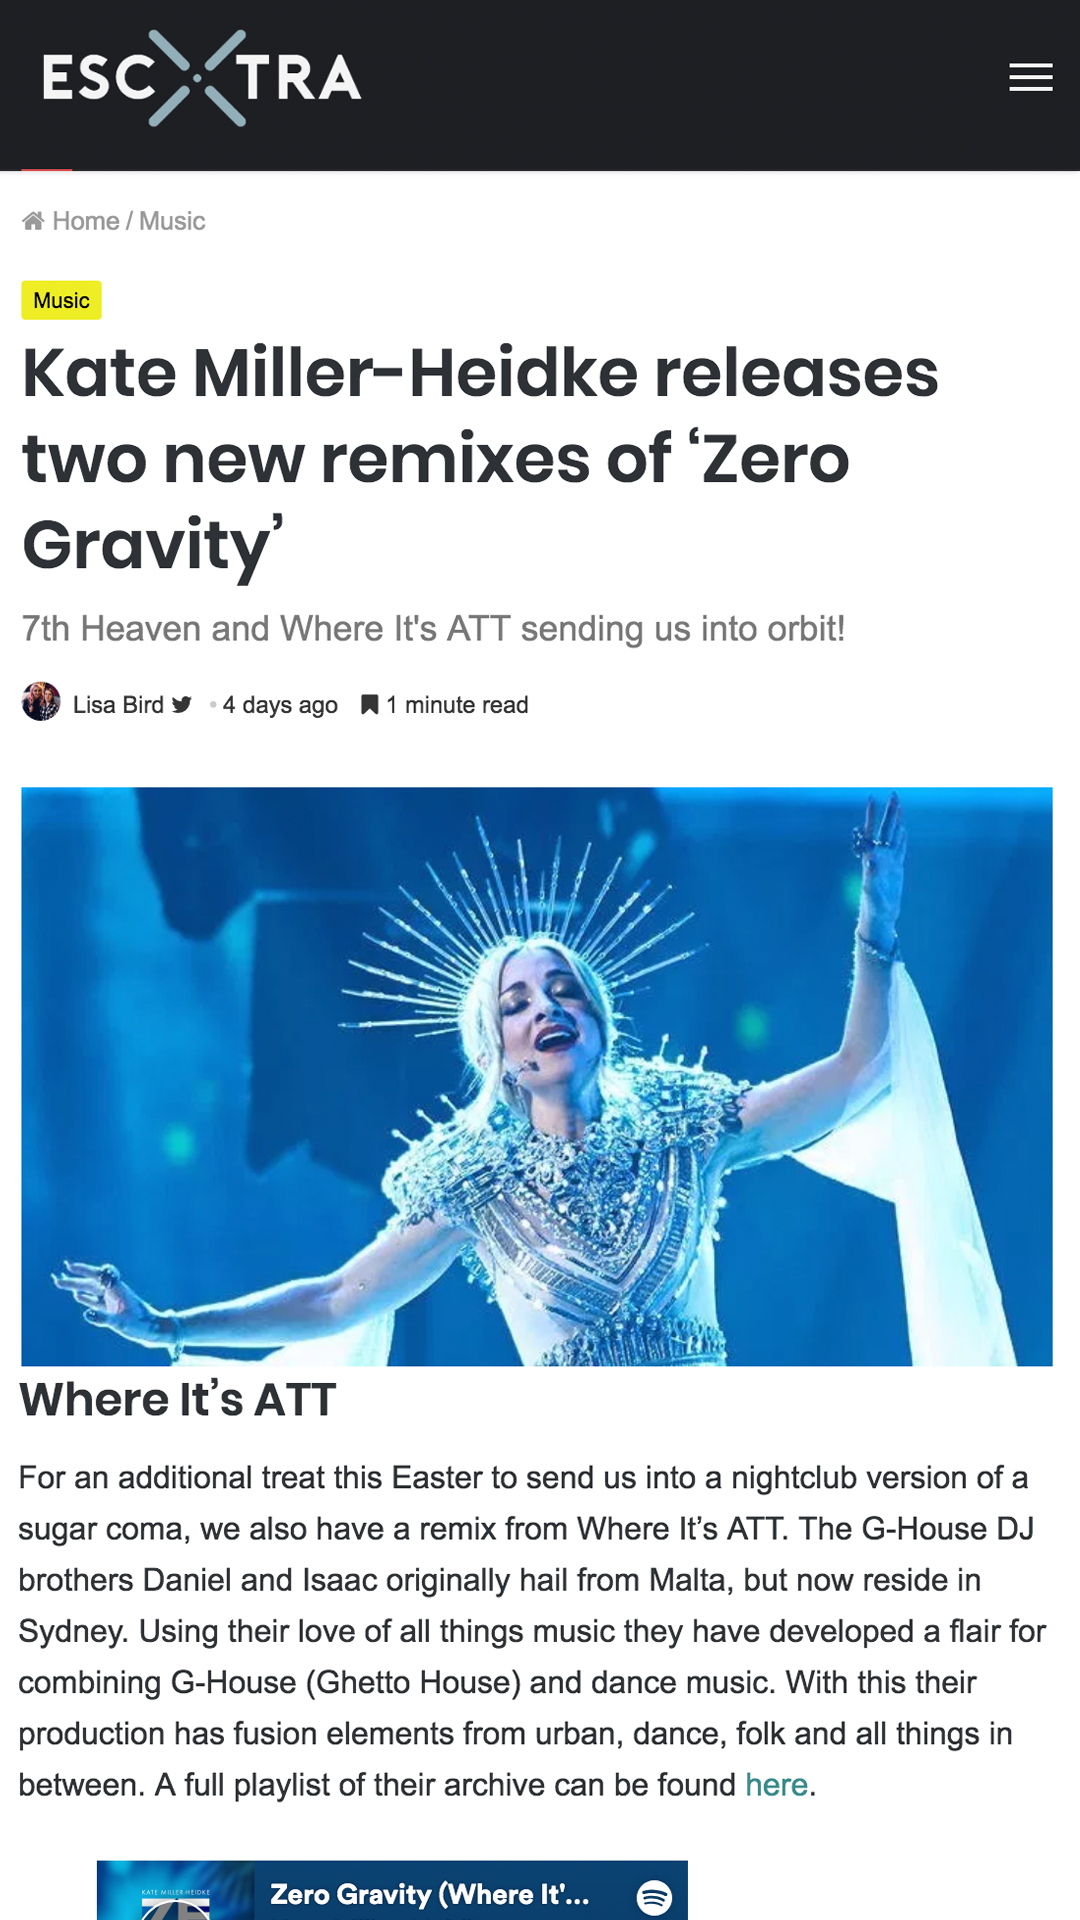 ESCXTRA - Zero Gravity WIA Remix